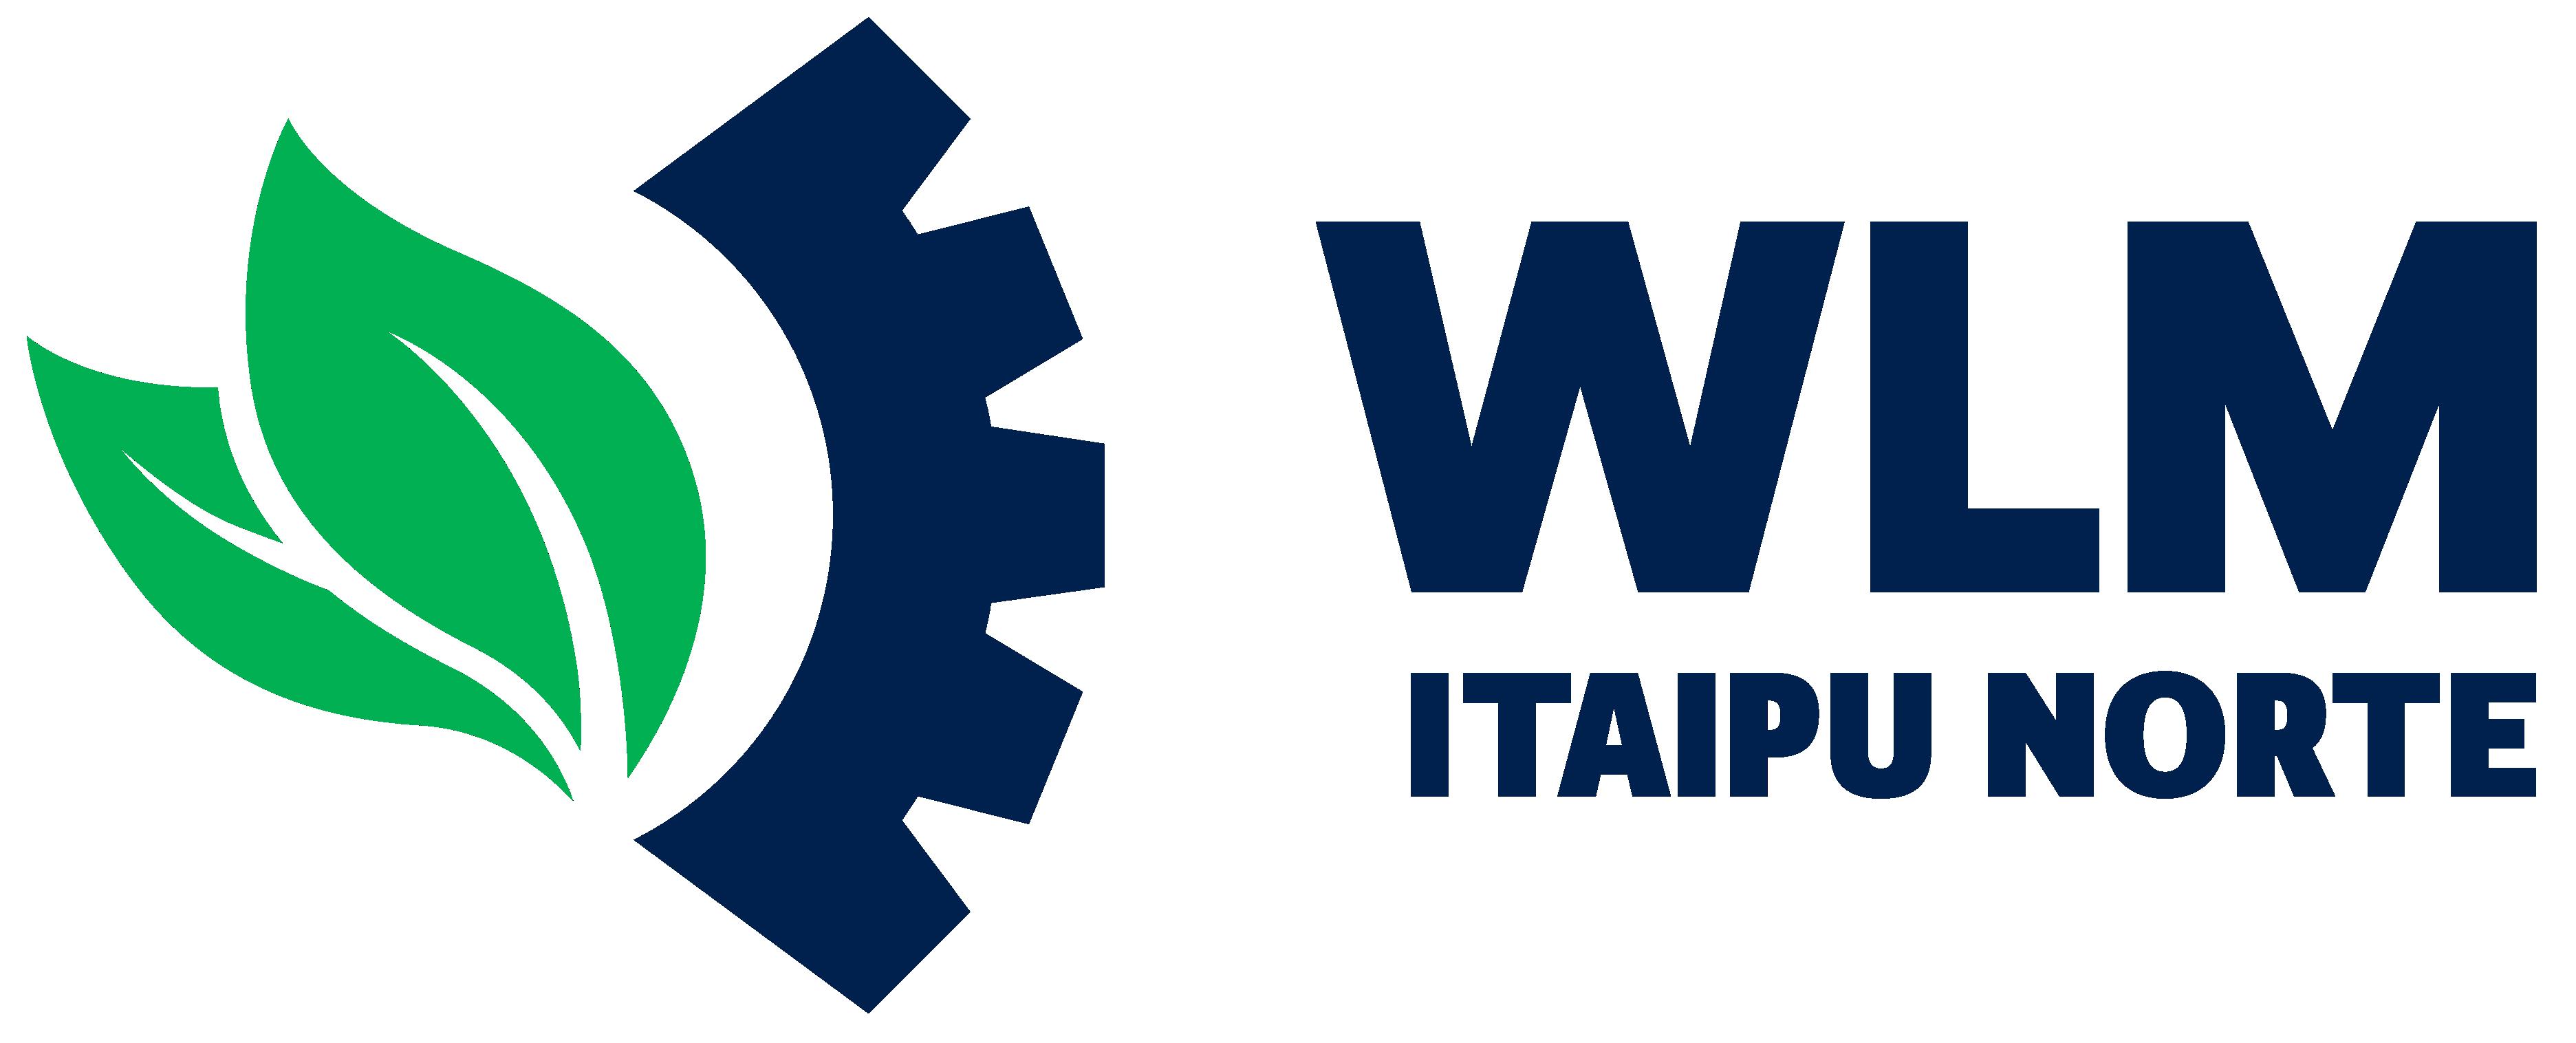 logo itaipu norte